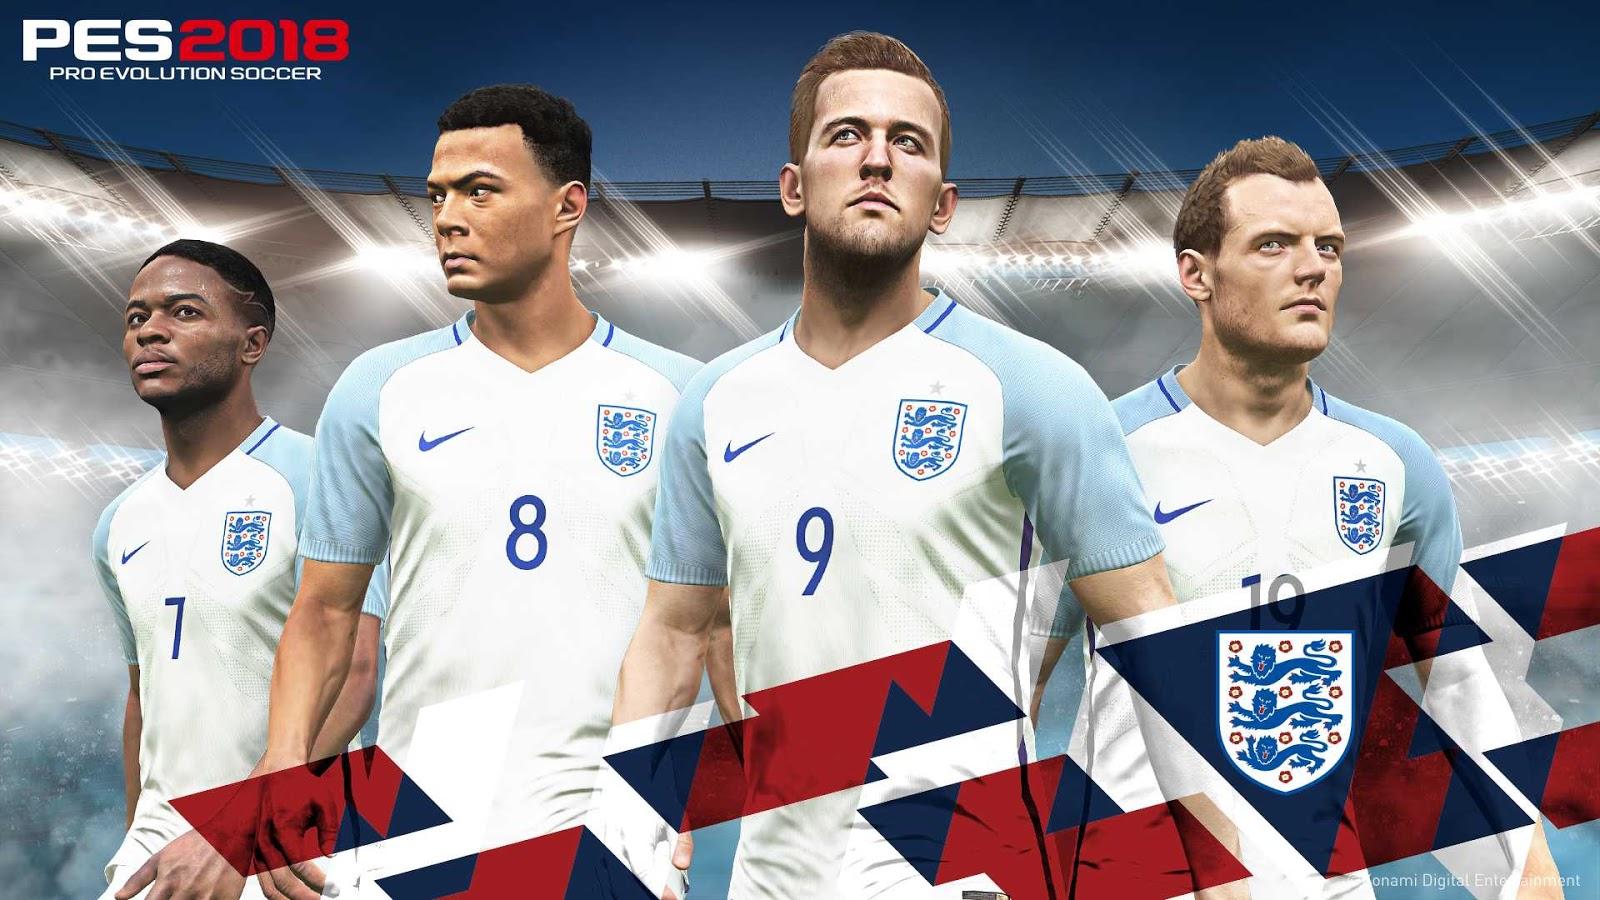 pro evolution soccer 2018 download free full version for pc